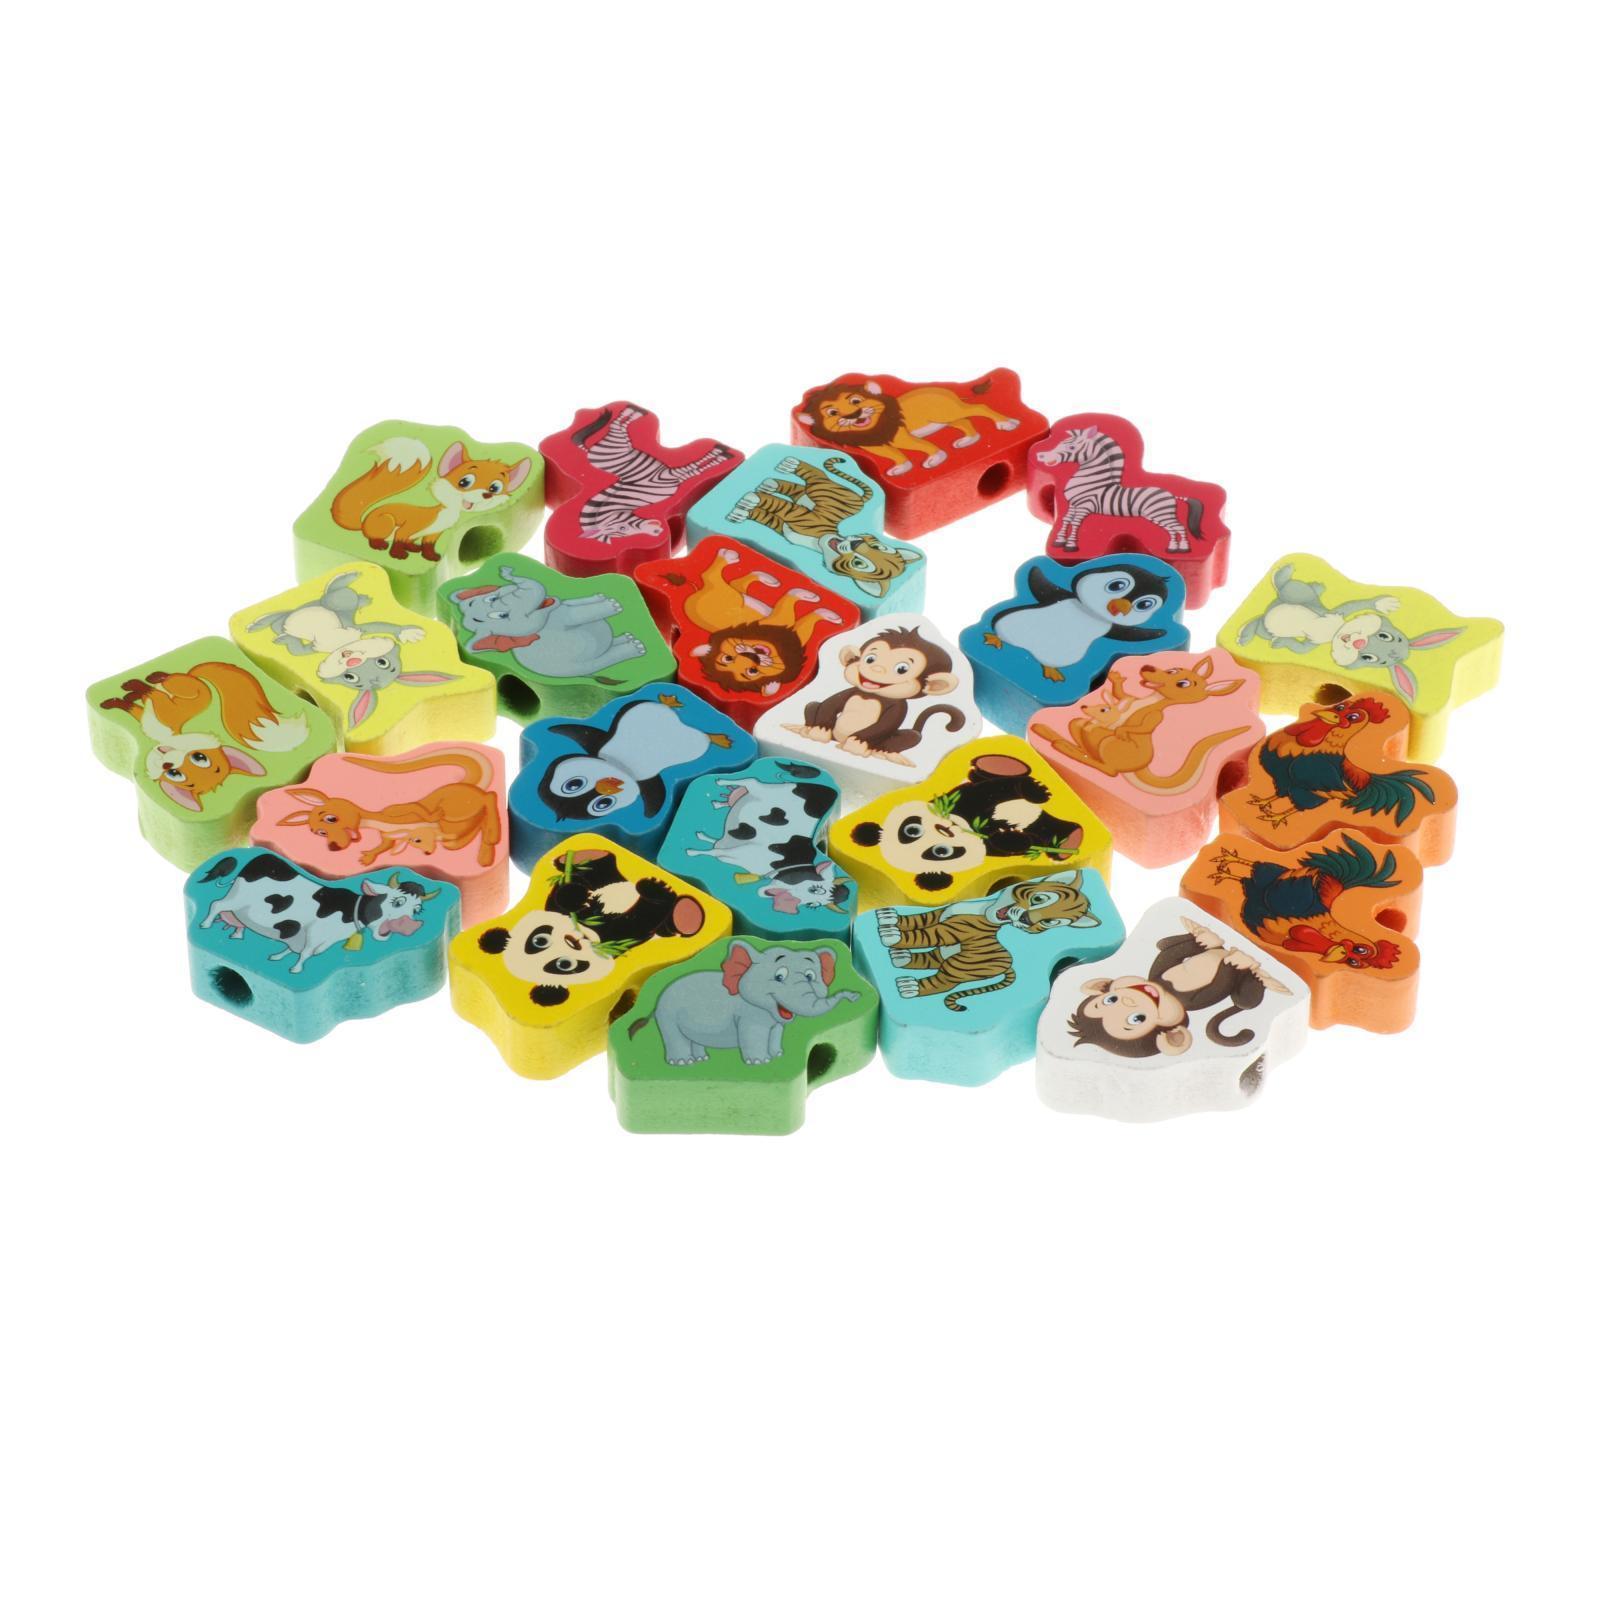 miniatura 23 - 24 pezzi di Legno FAI DA TE Perline Stringa Monterssori Le Capacità Motorie